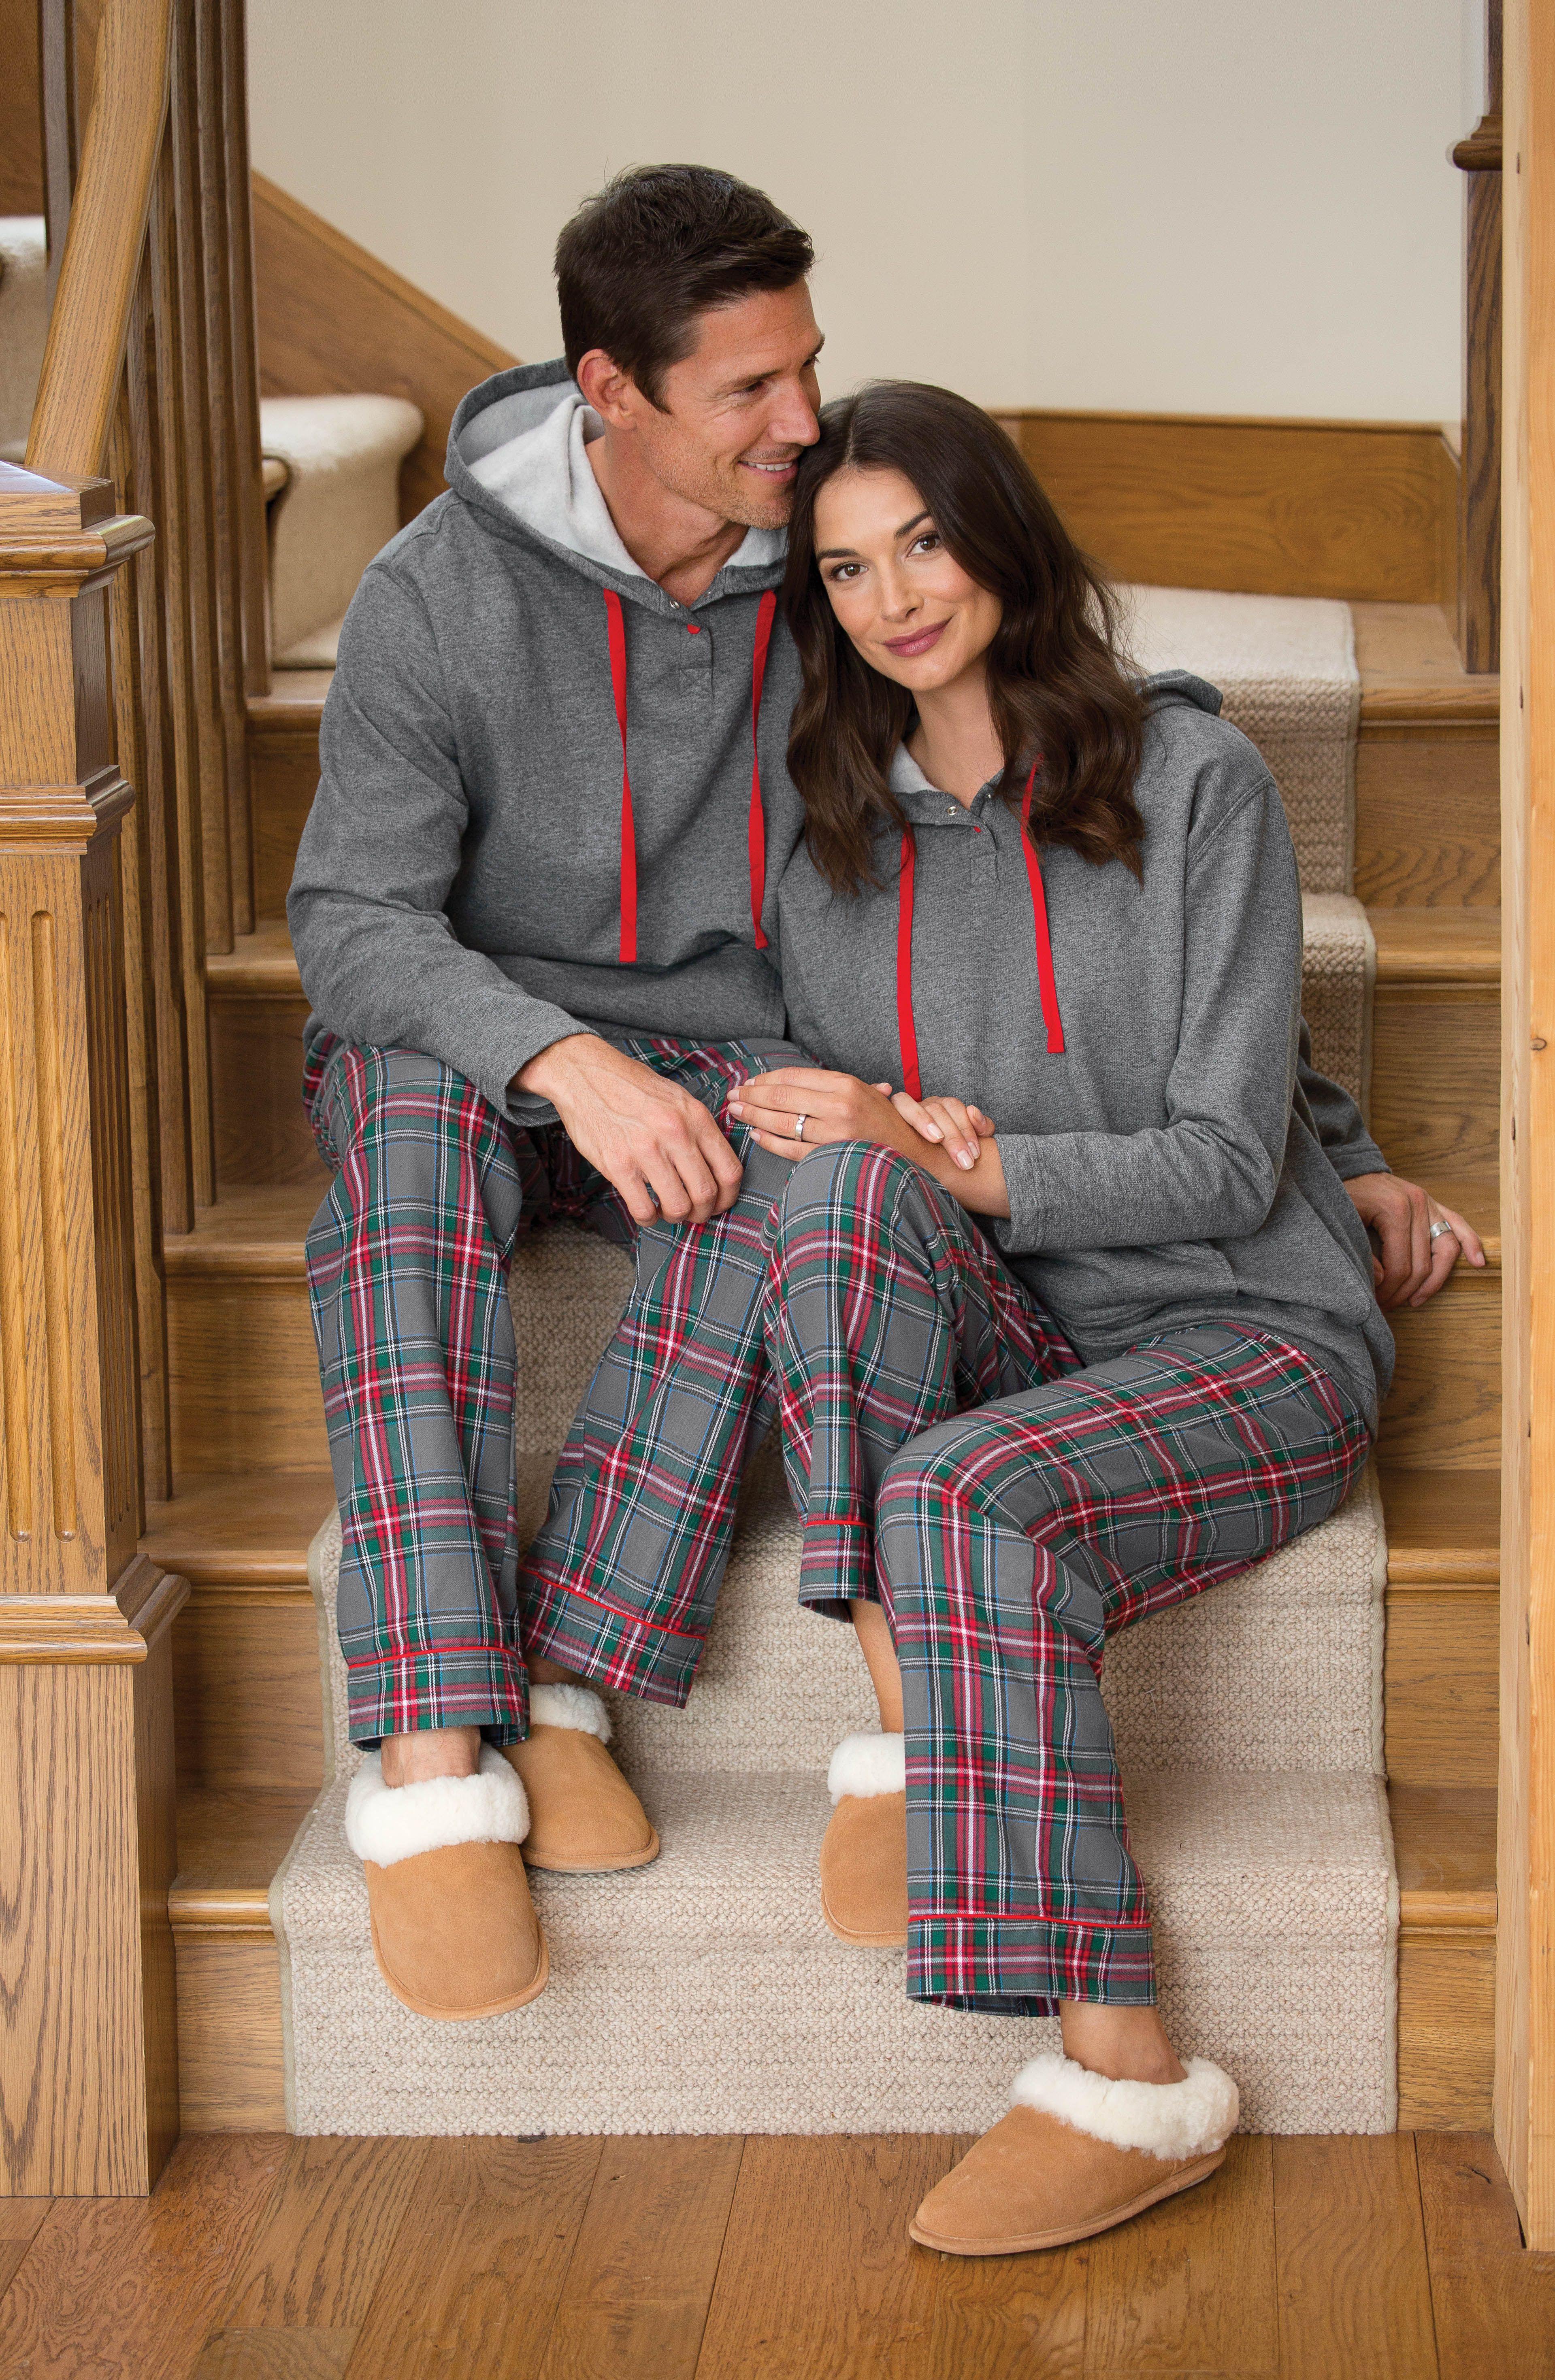 Gray Plaid Hooded His & Hers Matching Pajamas Matching